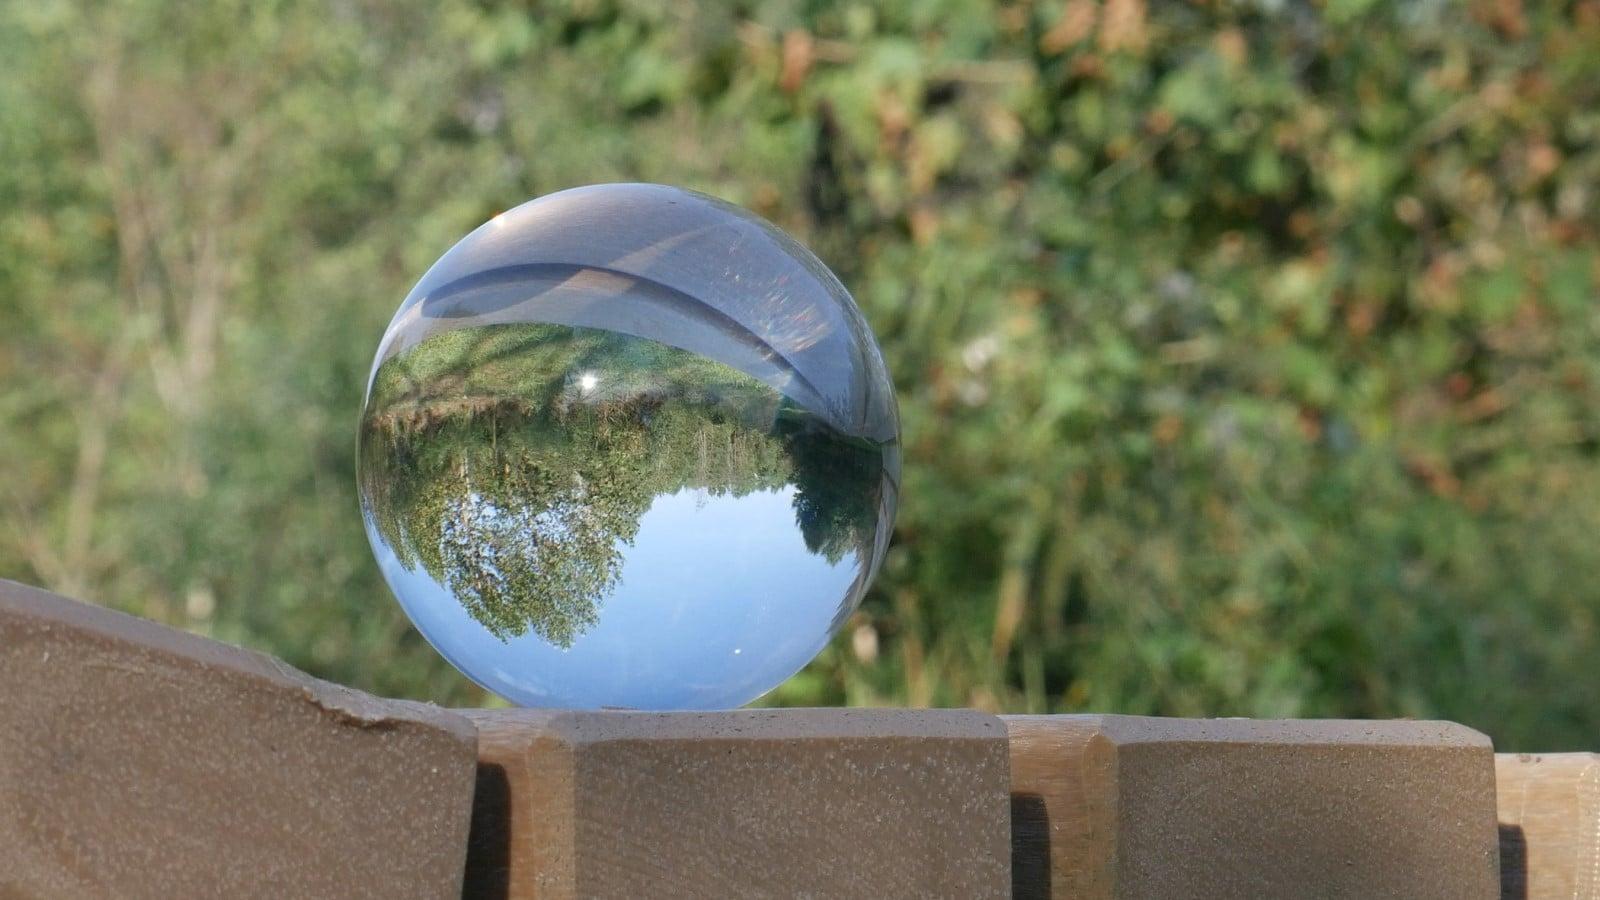 photography mirror ball